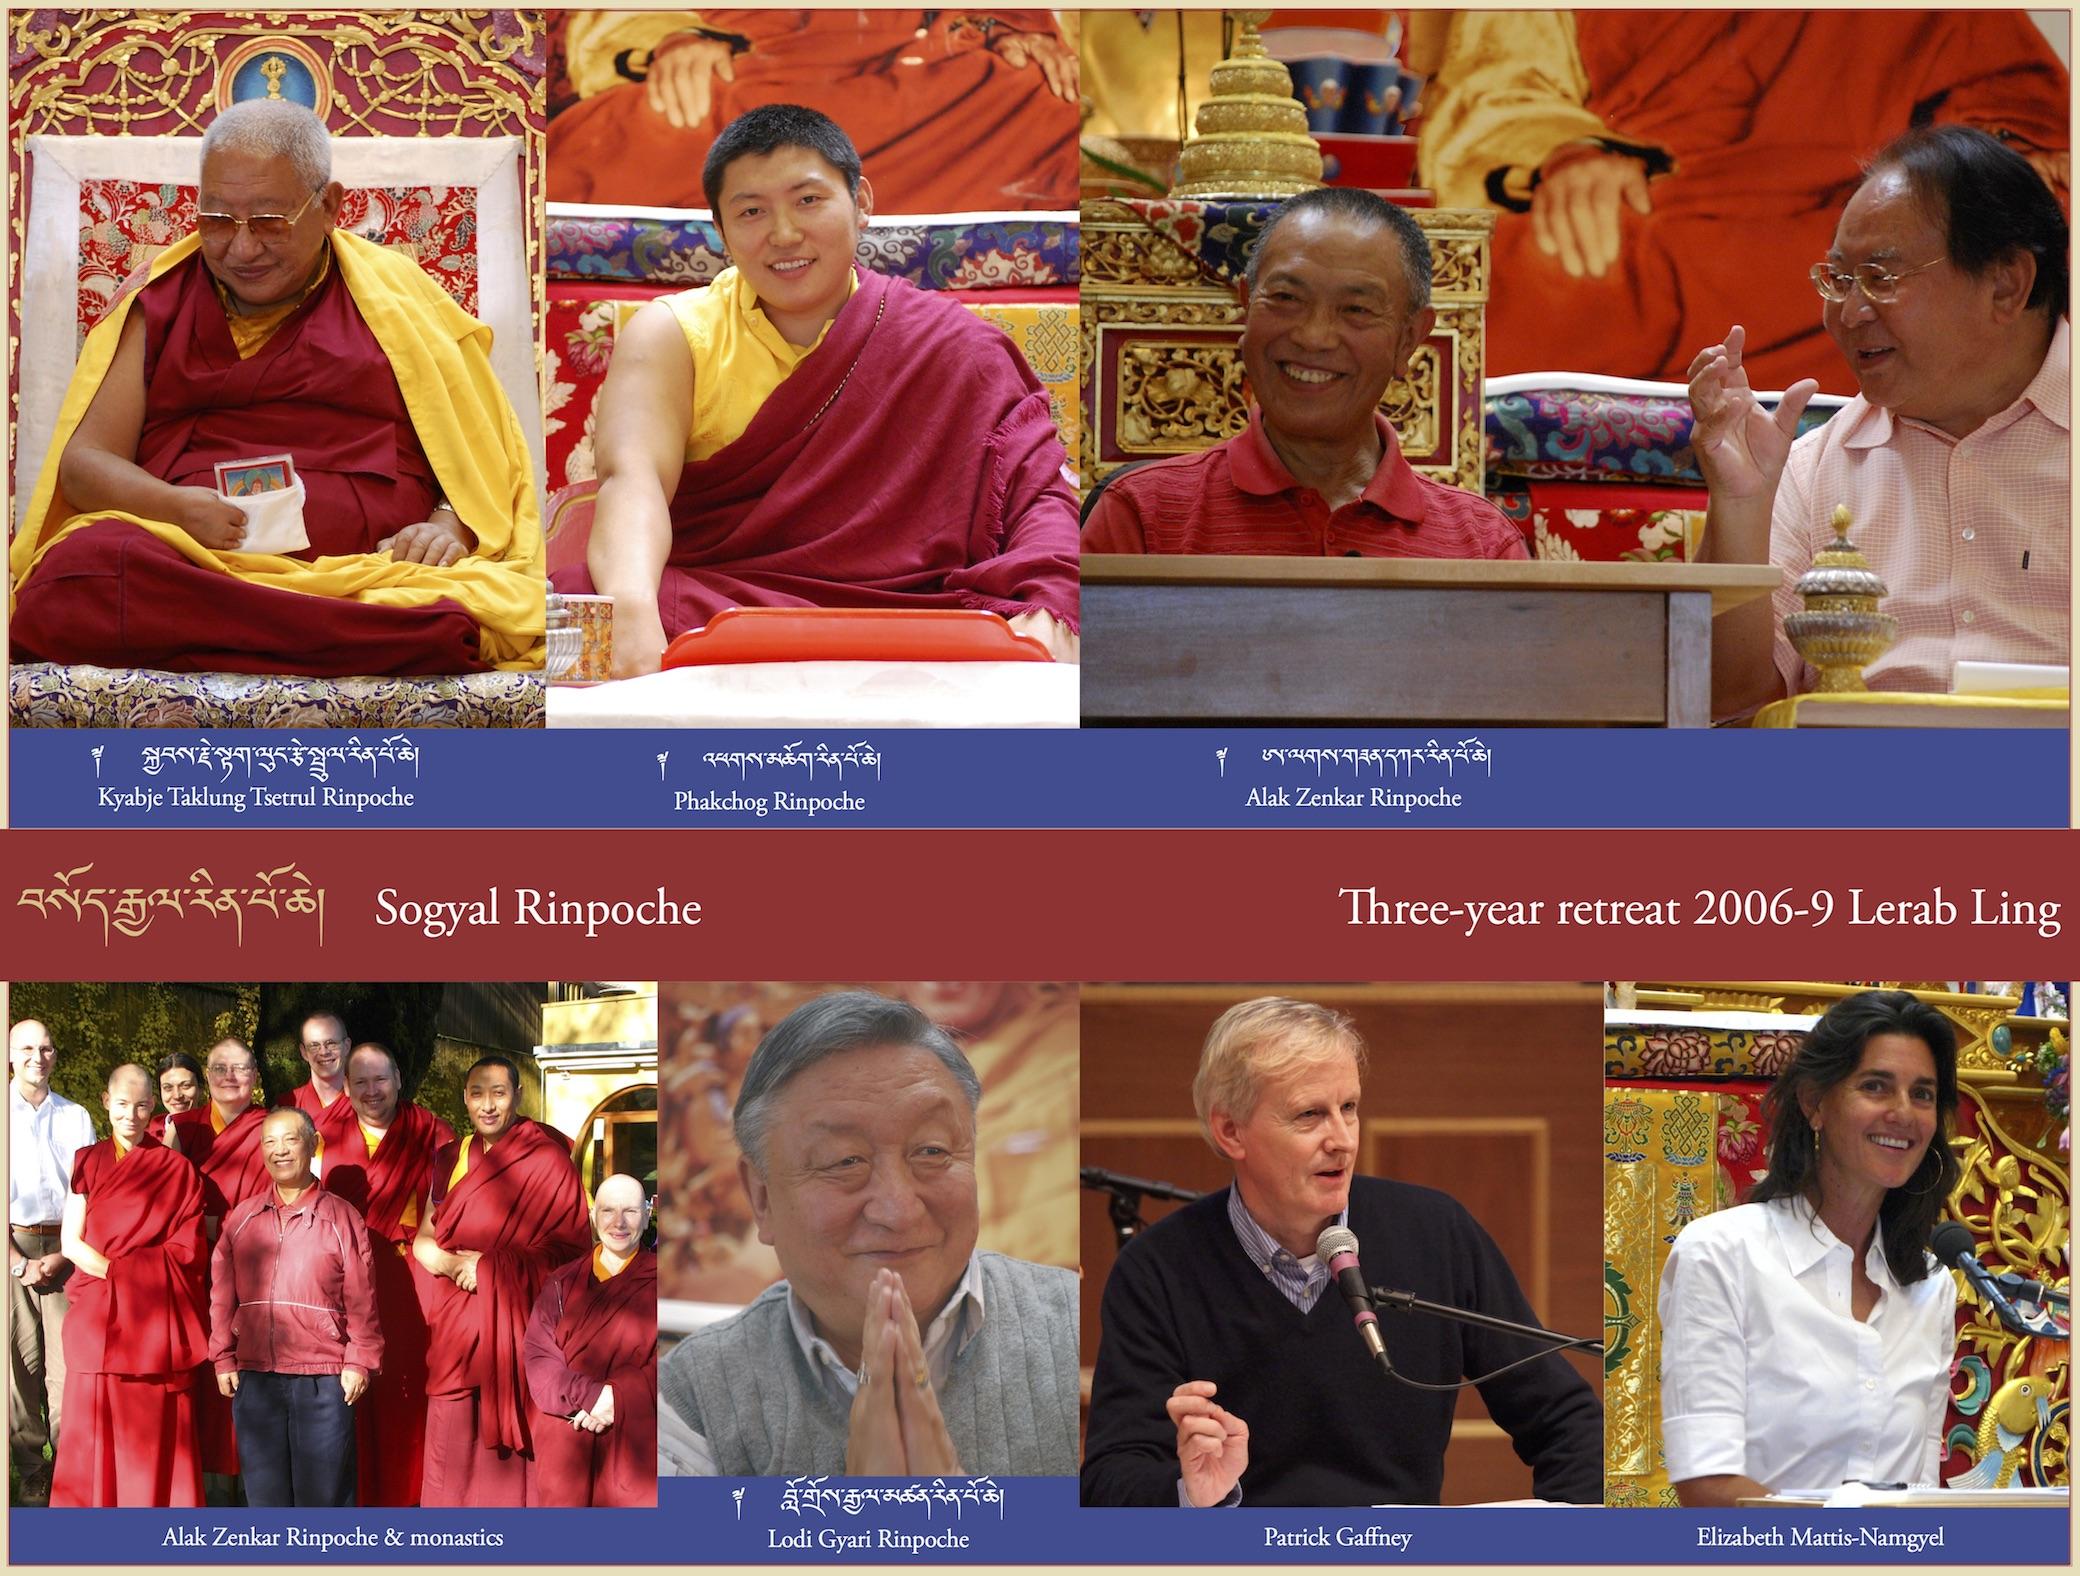 Three-year retreat, 2006-9 Lerab Ling (3)